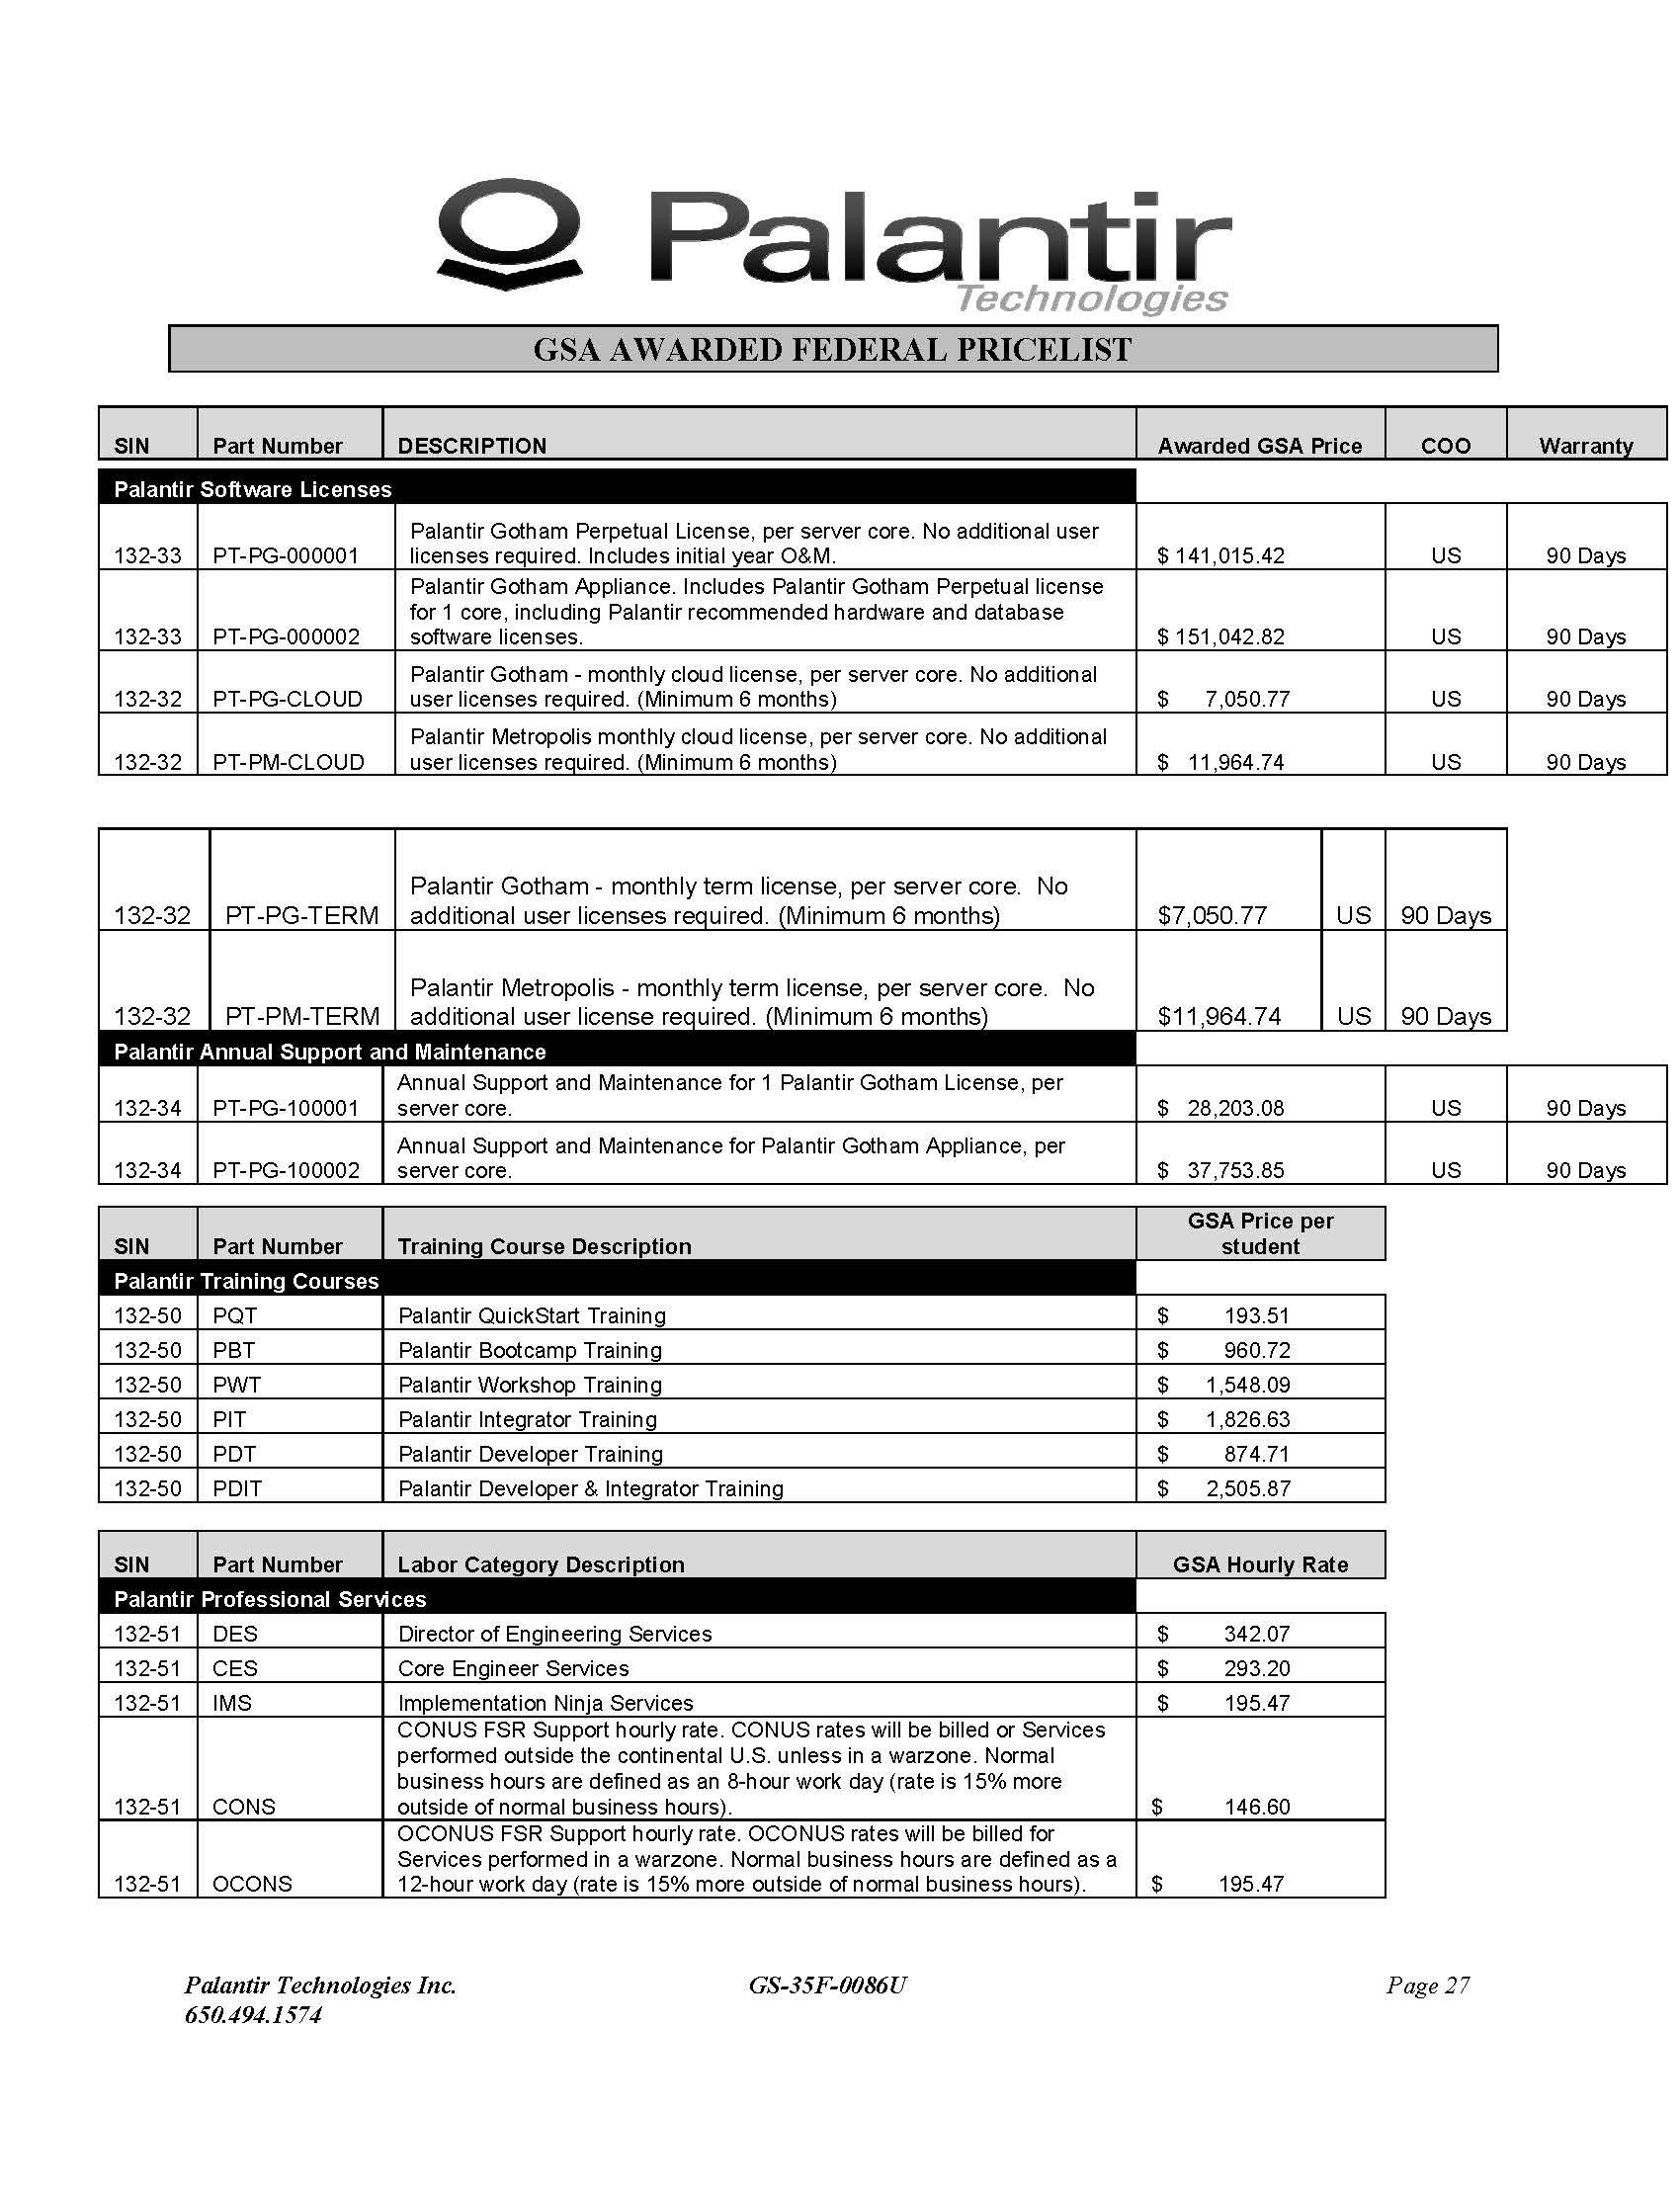 General Services Administration Palantir Technologies